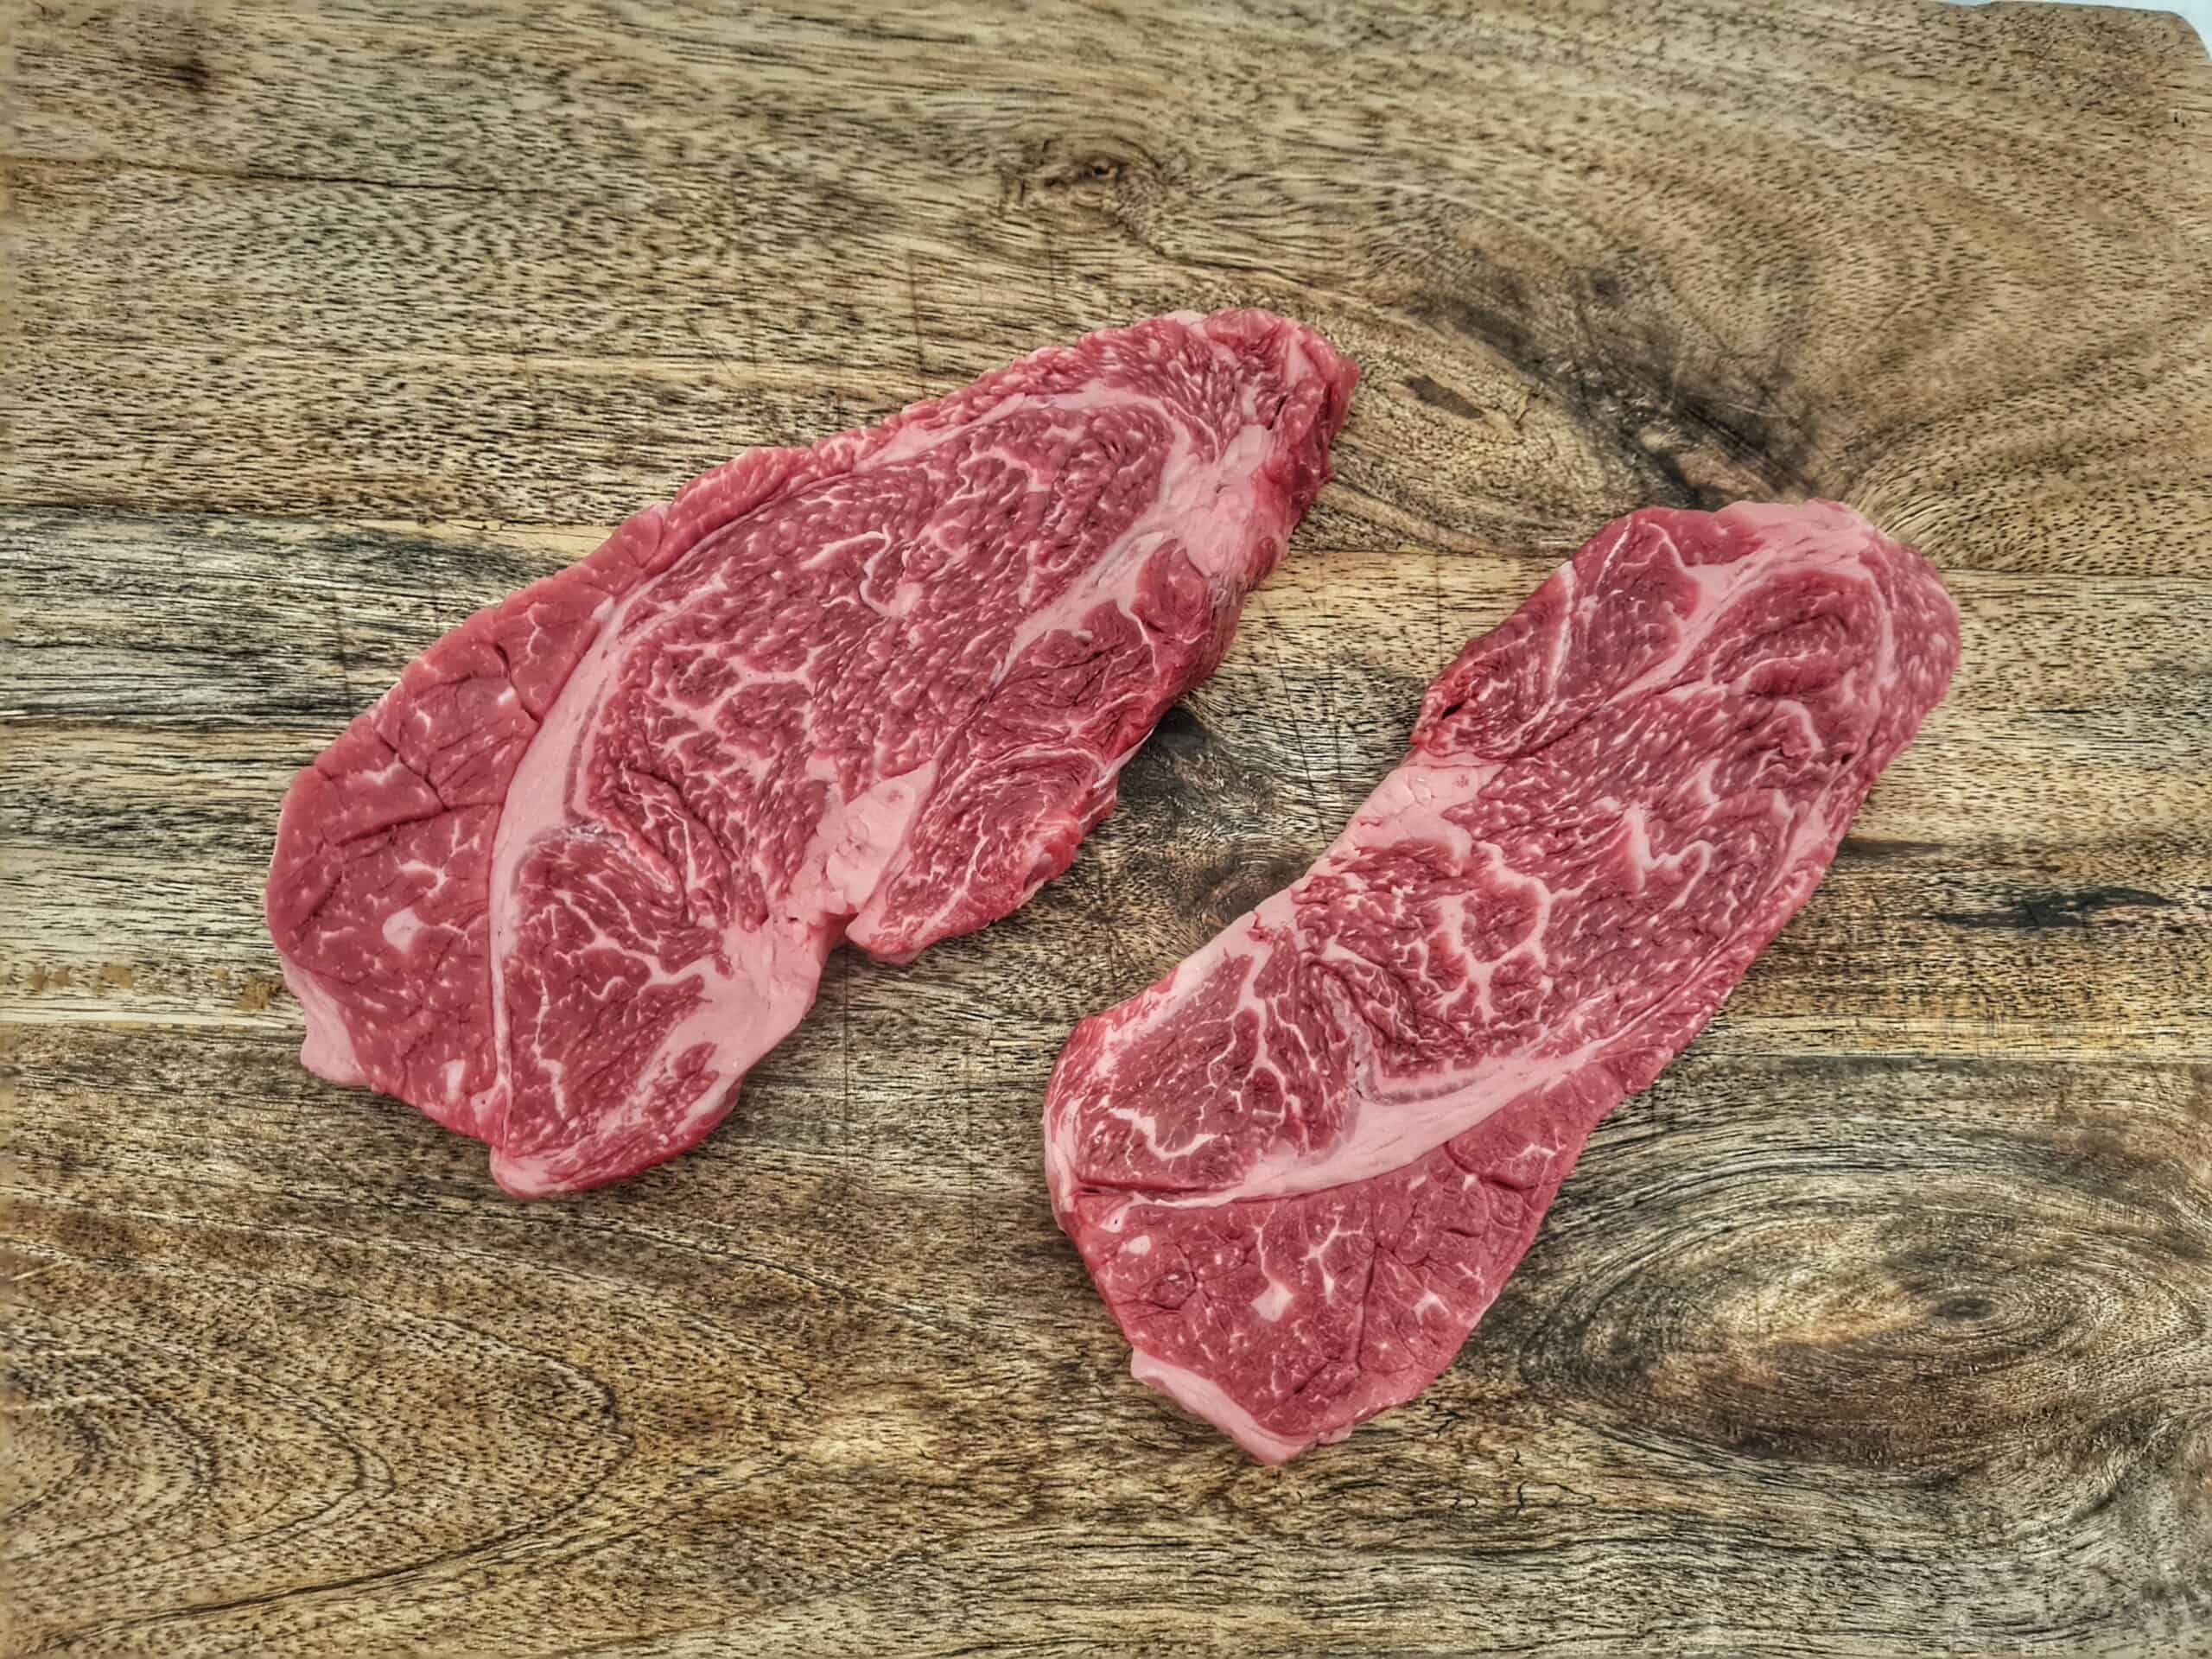 Chuckroll steak wagyu